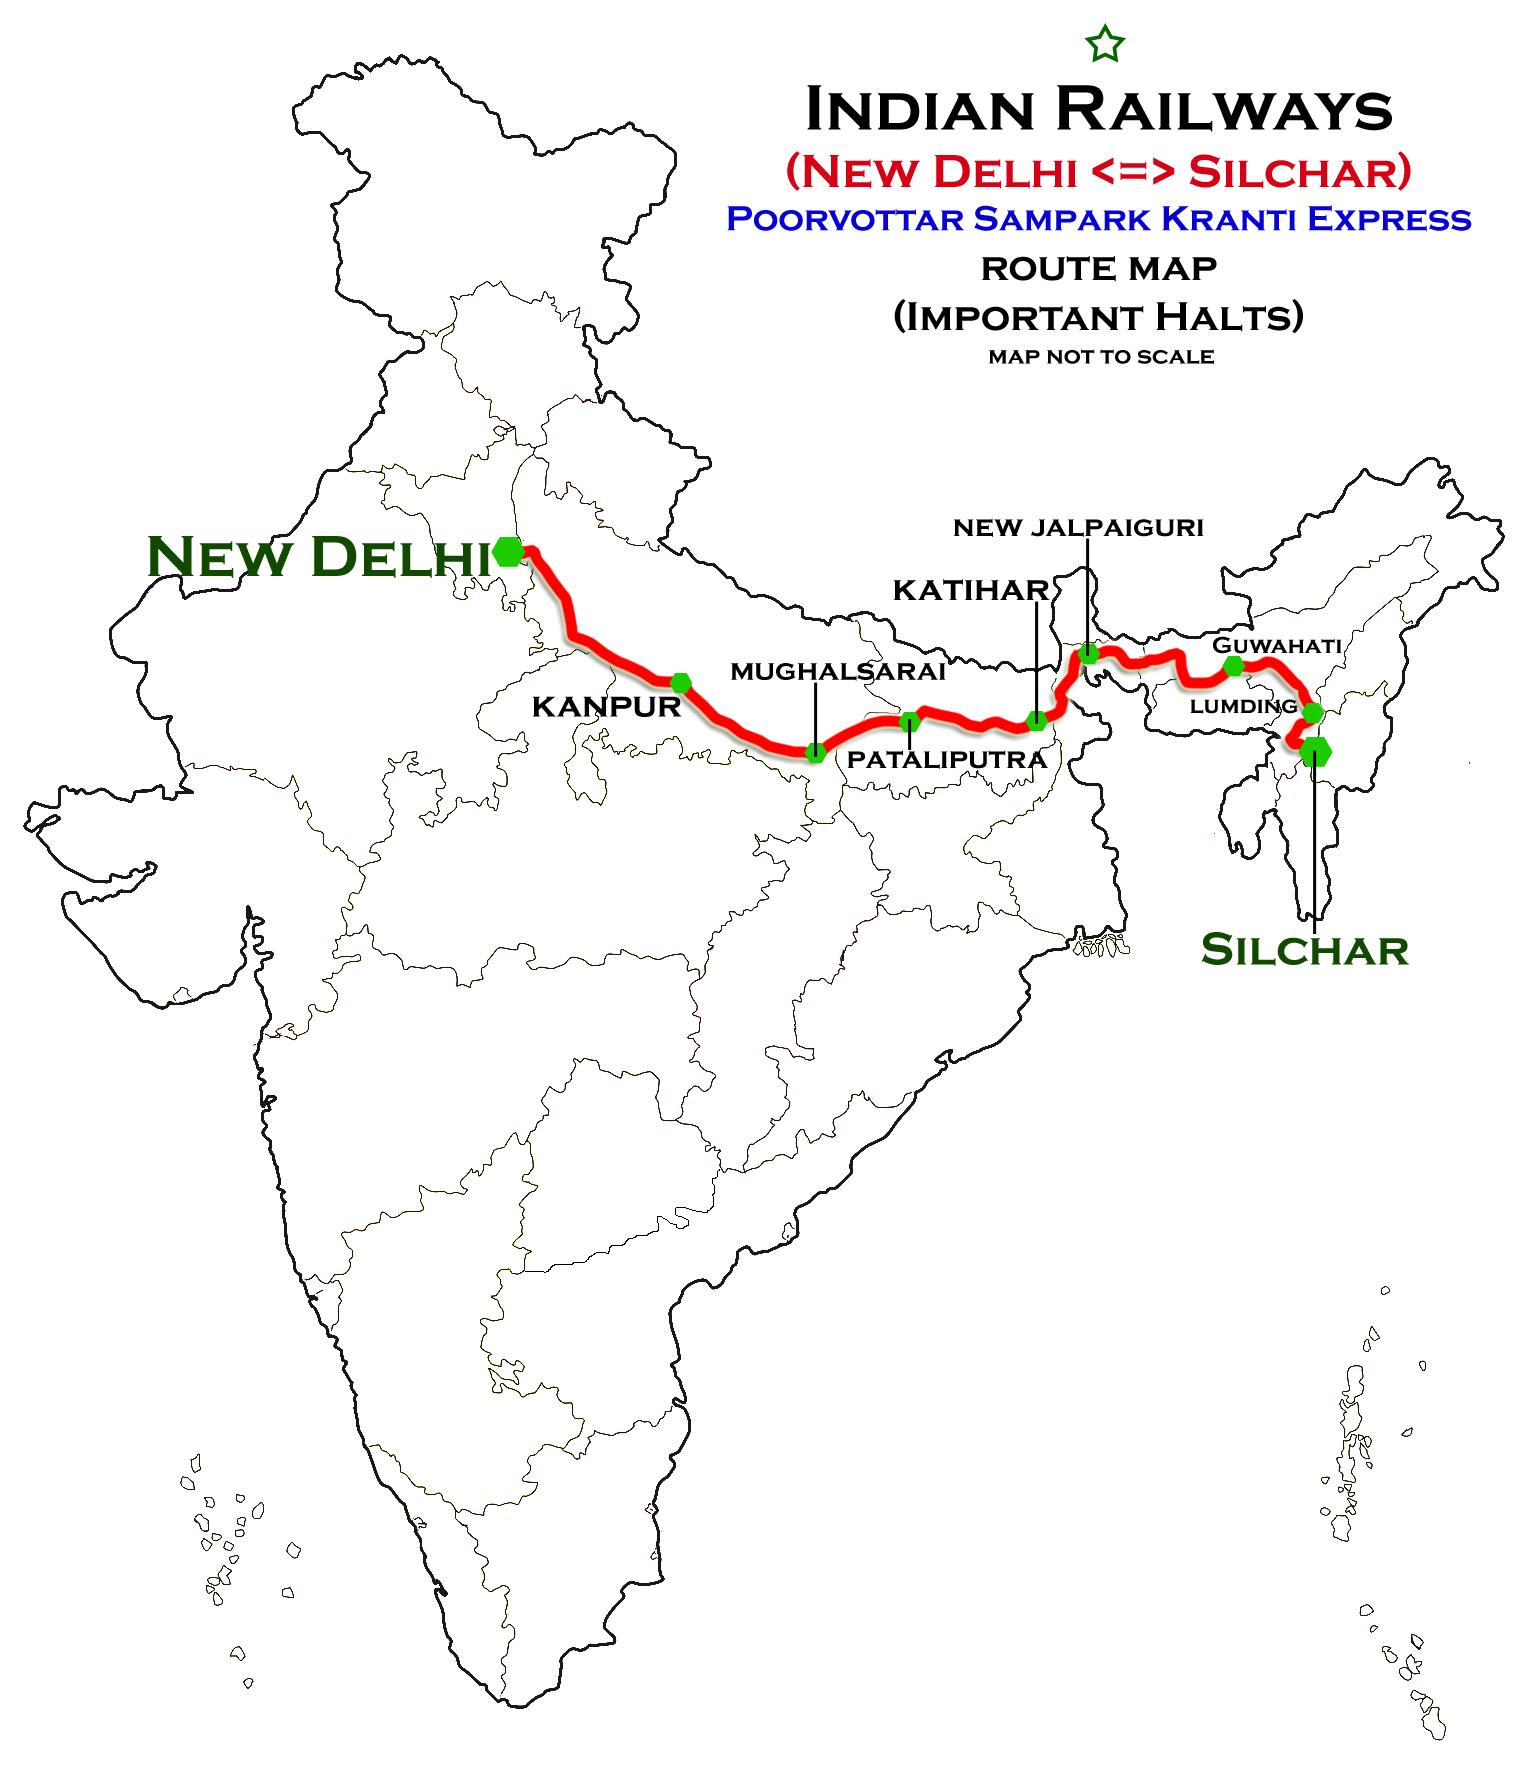 Silchar - New Delhi Poorvottar Sampark Kranti Express